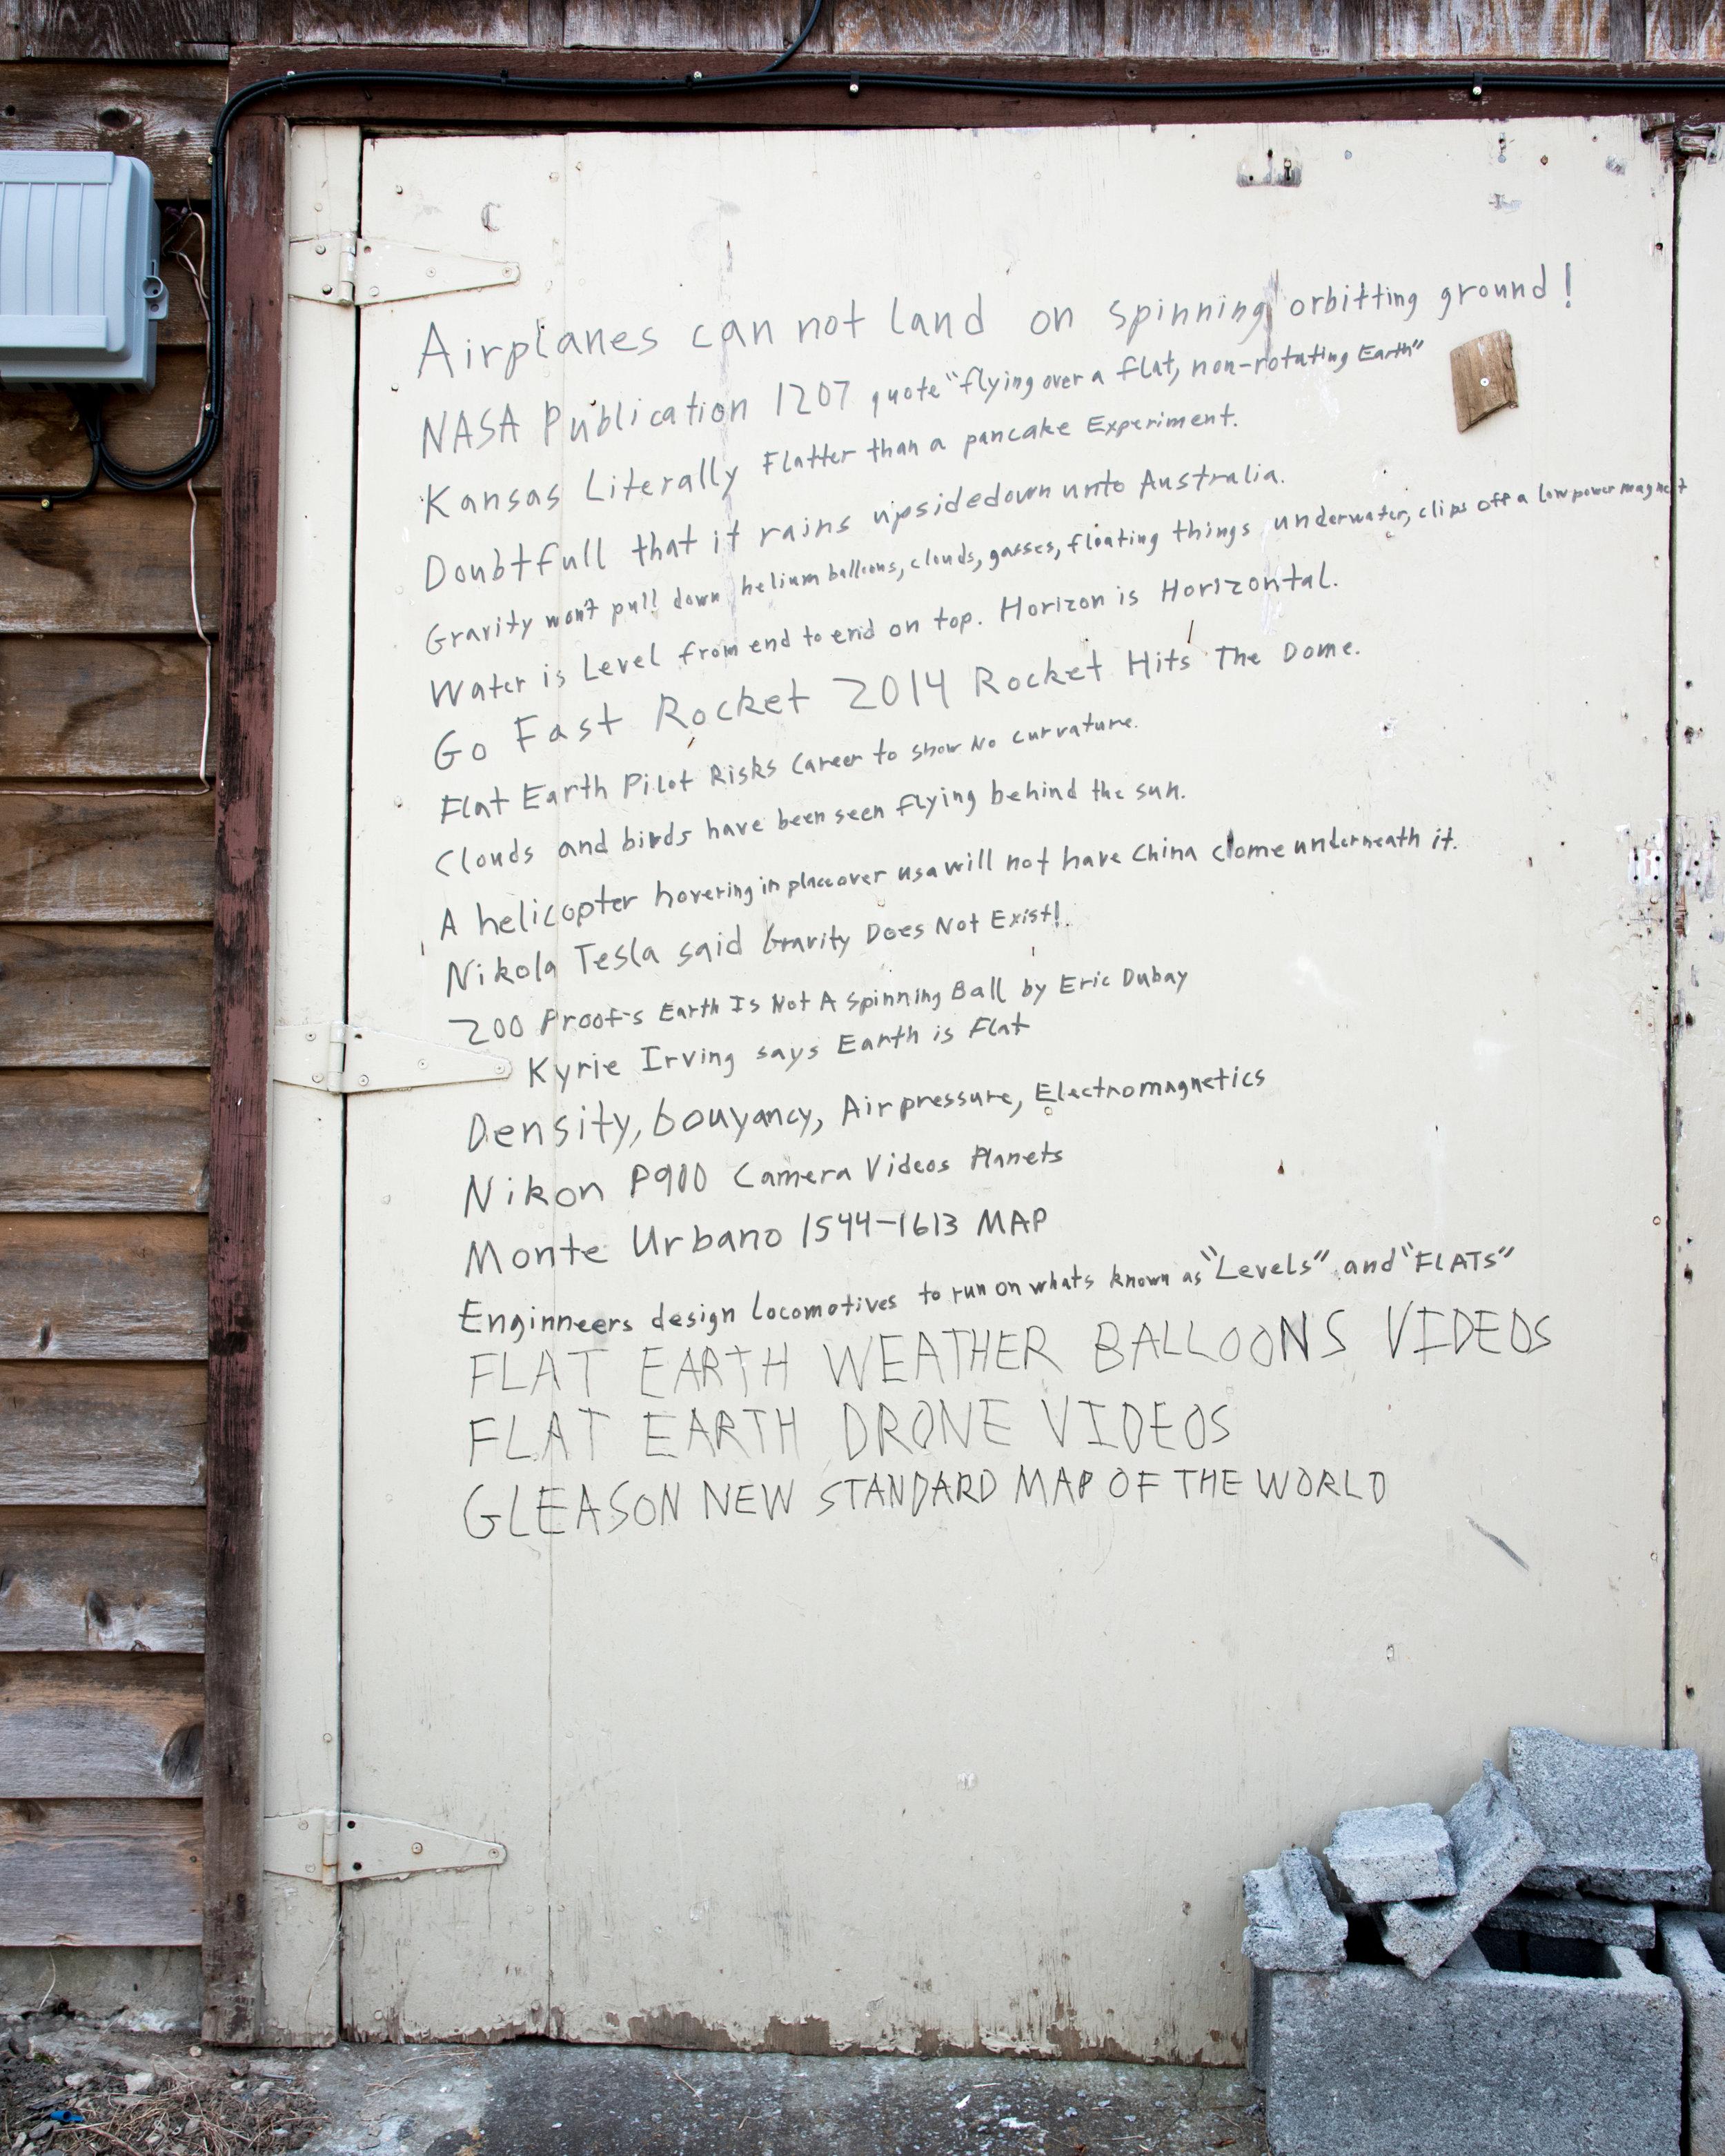 Flat Earth Manifesto, Johnson City, TN. 2017.